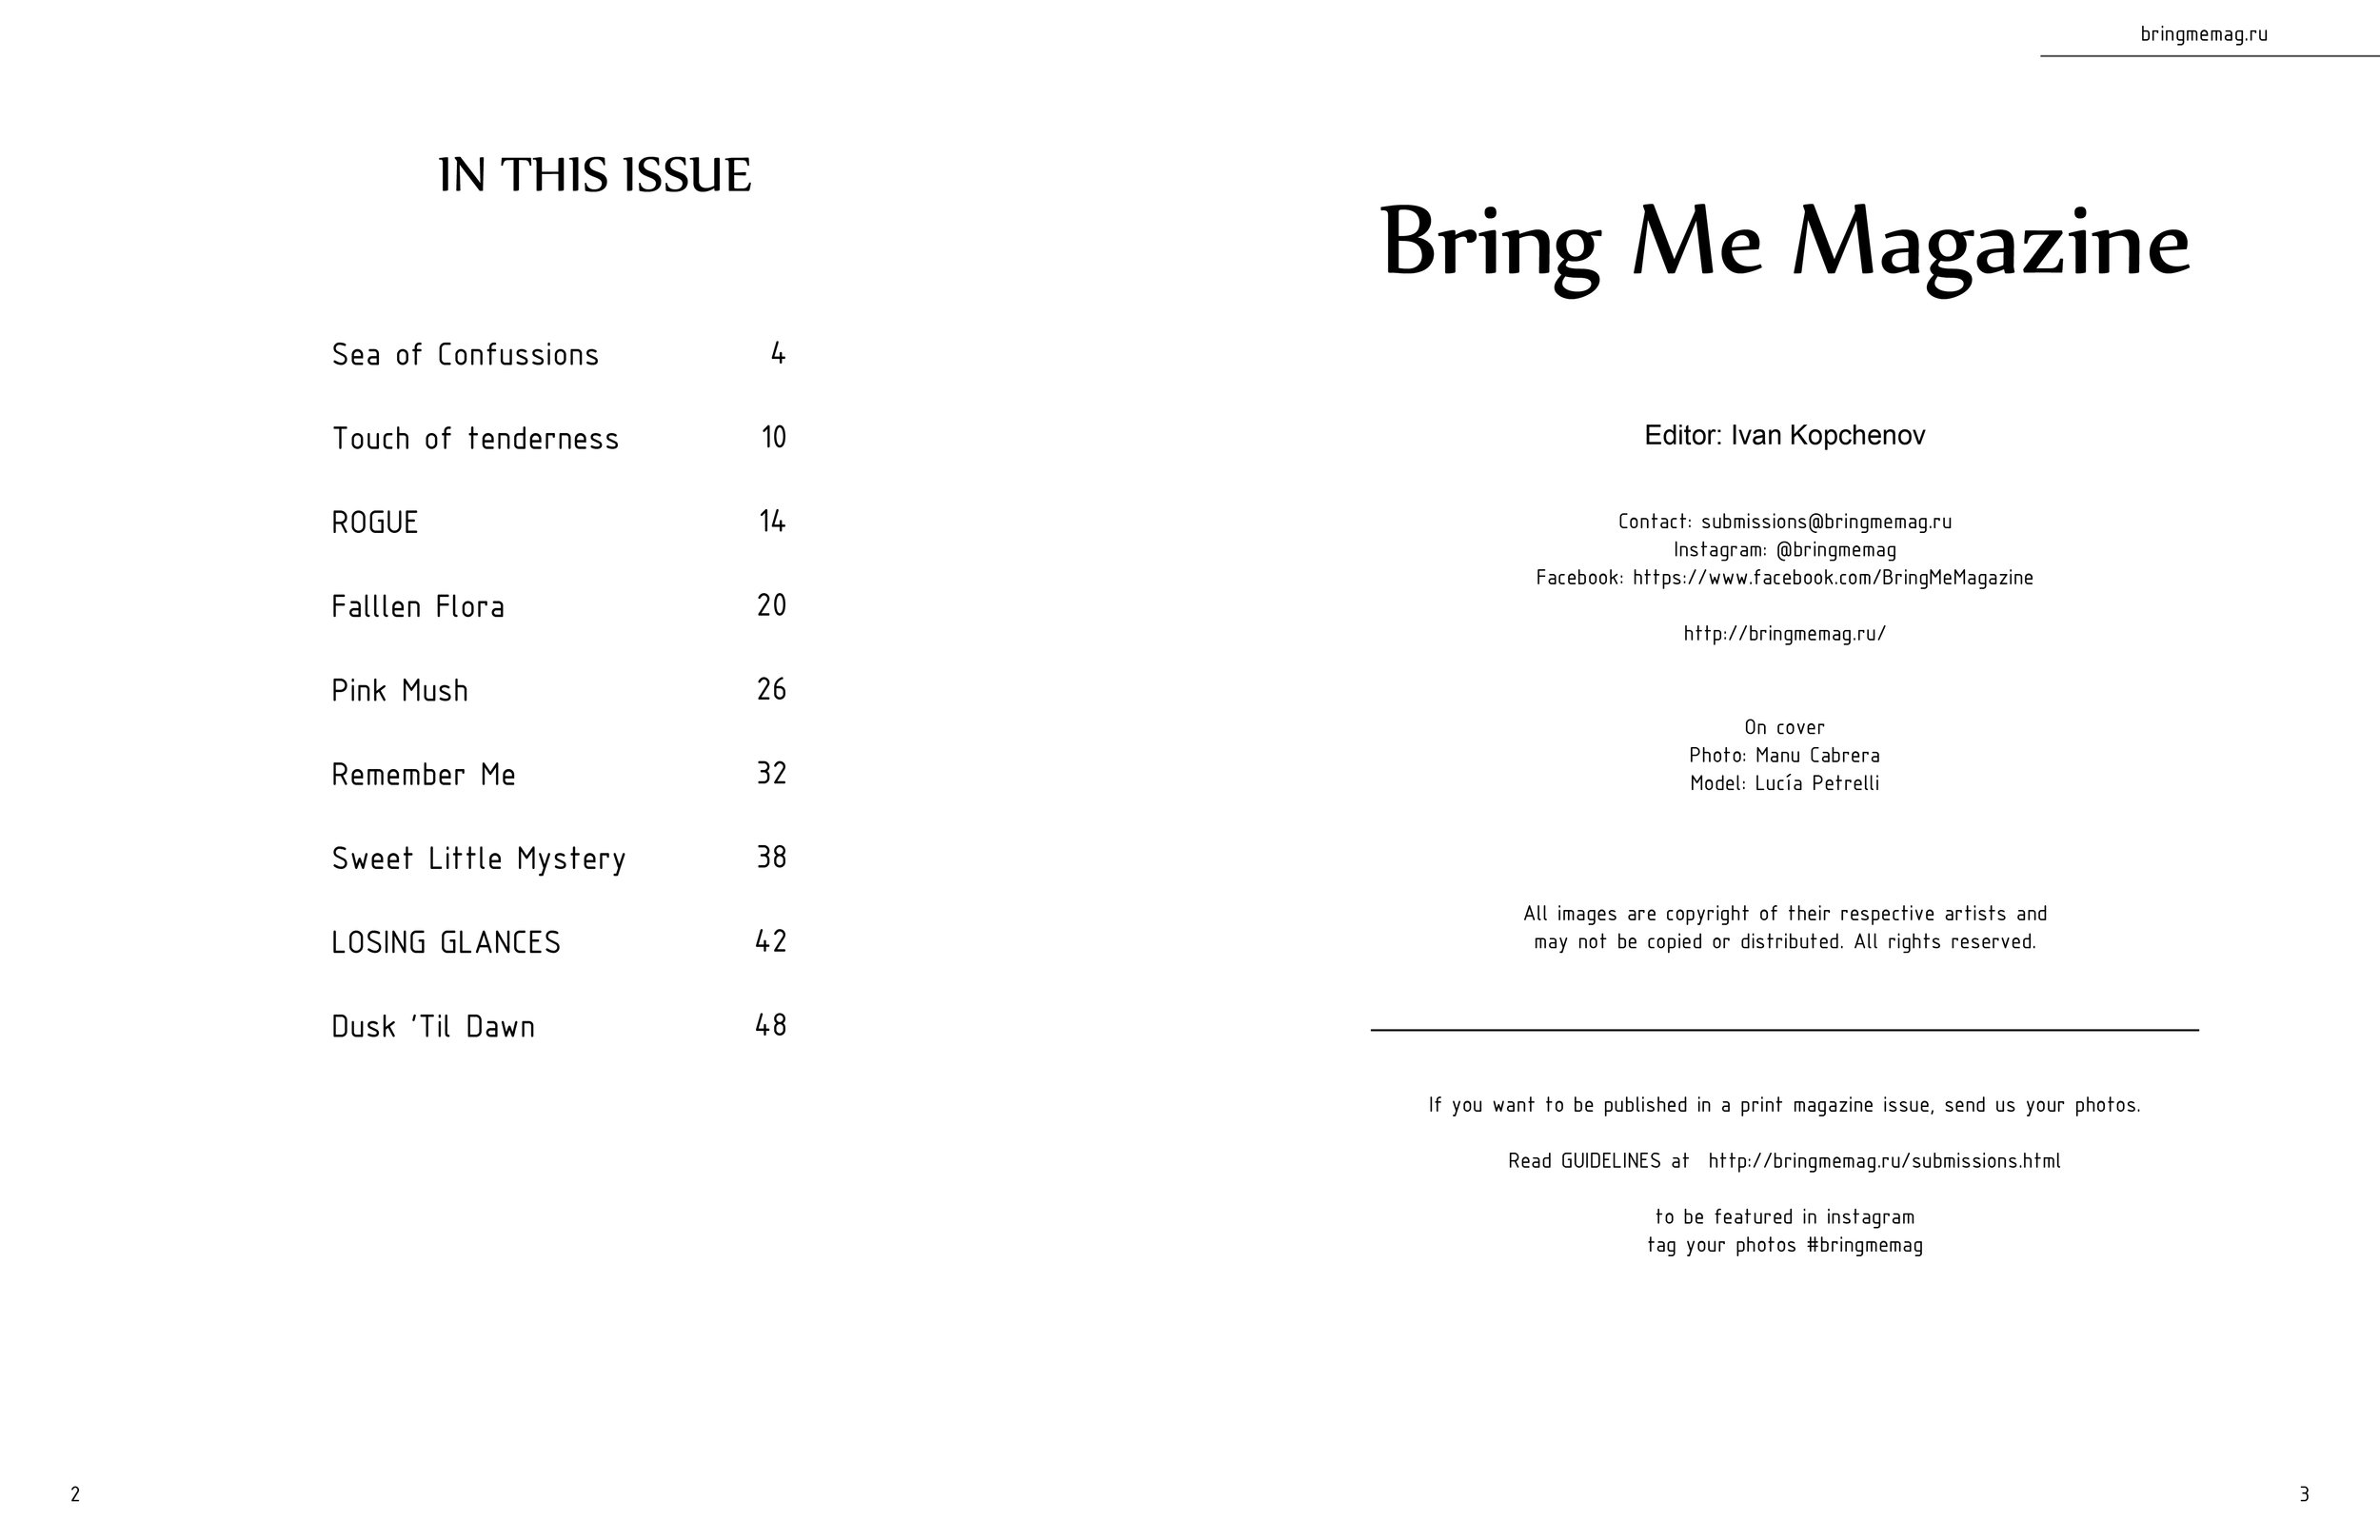 bring-me-magazine-issue12.jpg